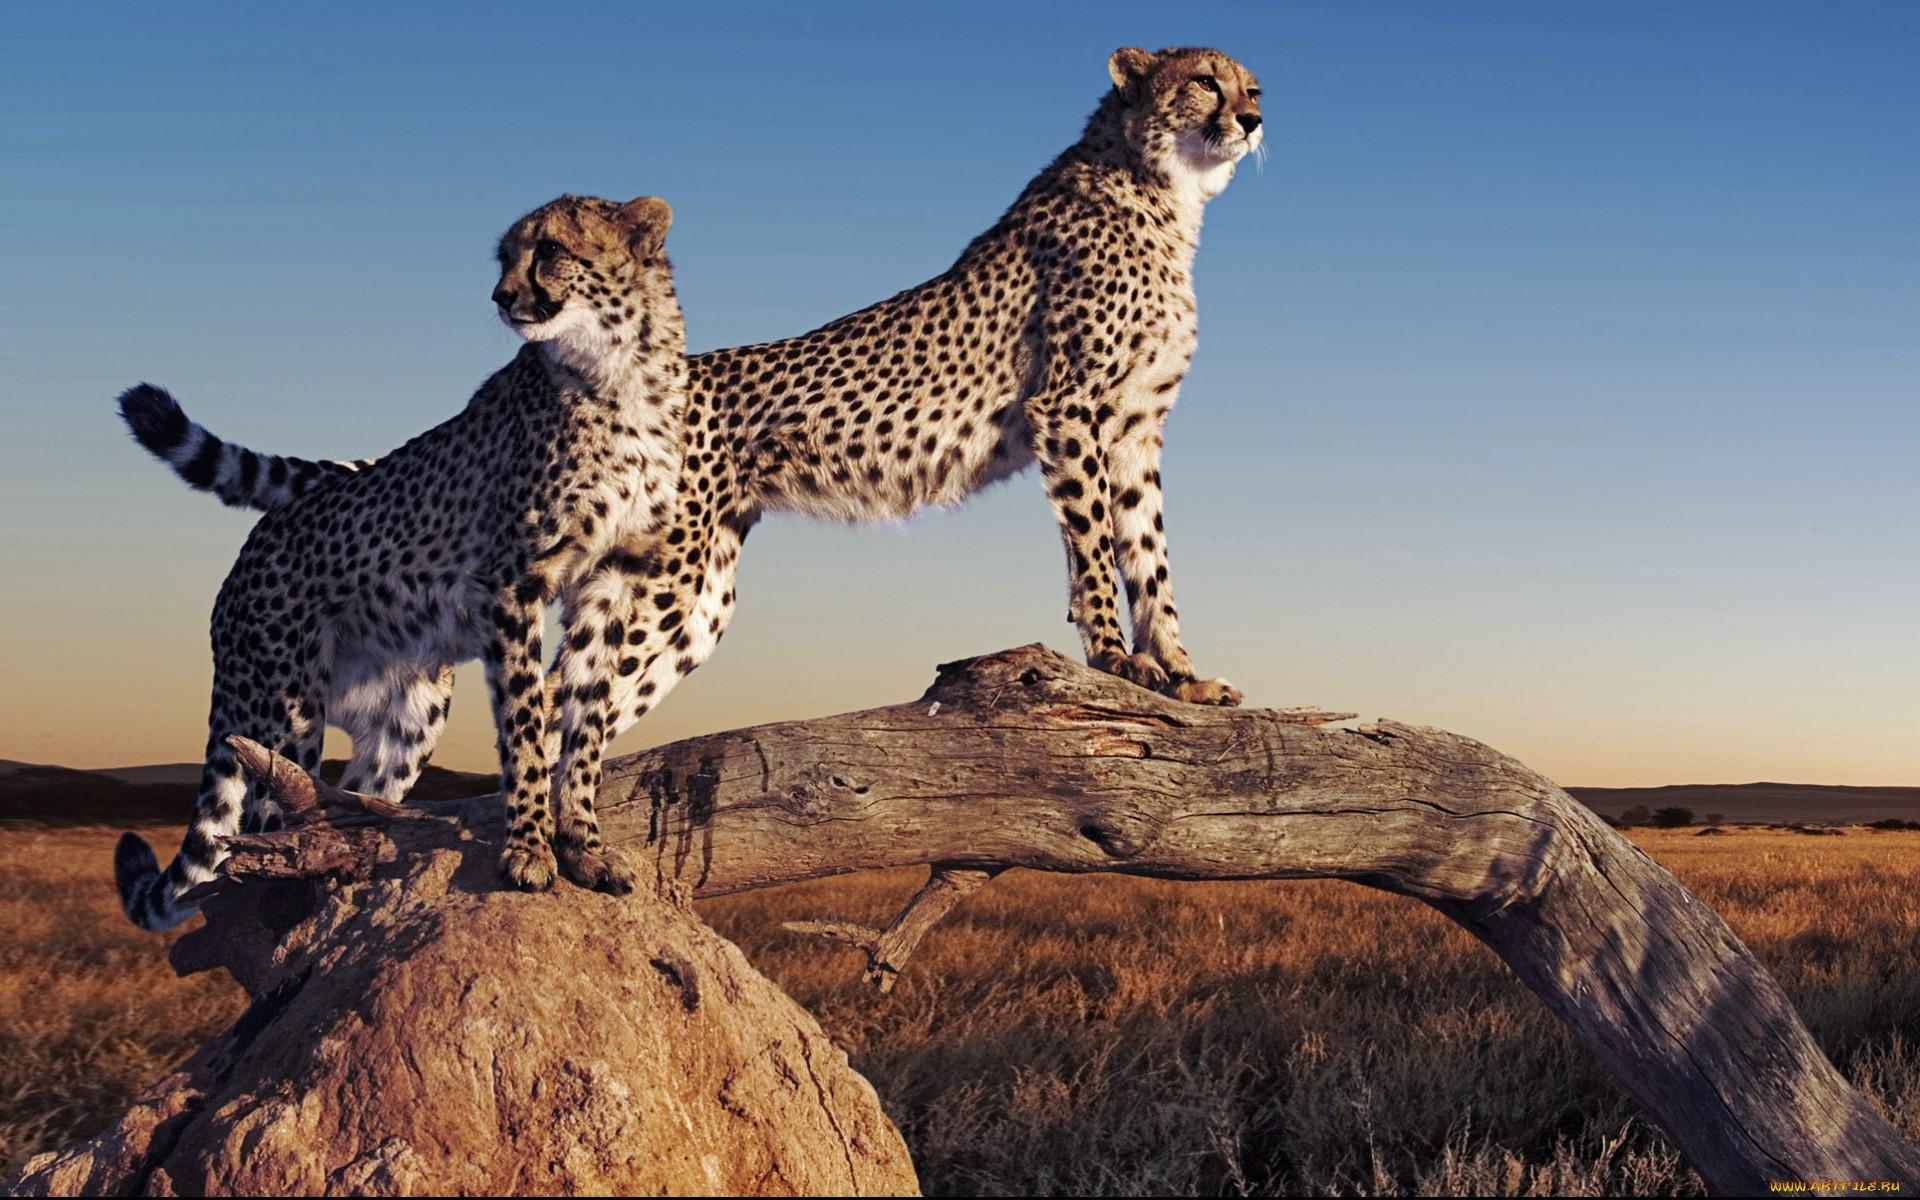 Cheetah Full HD Wallpaper and Background